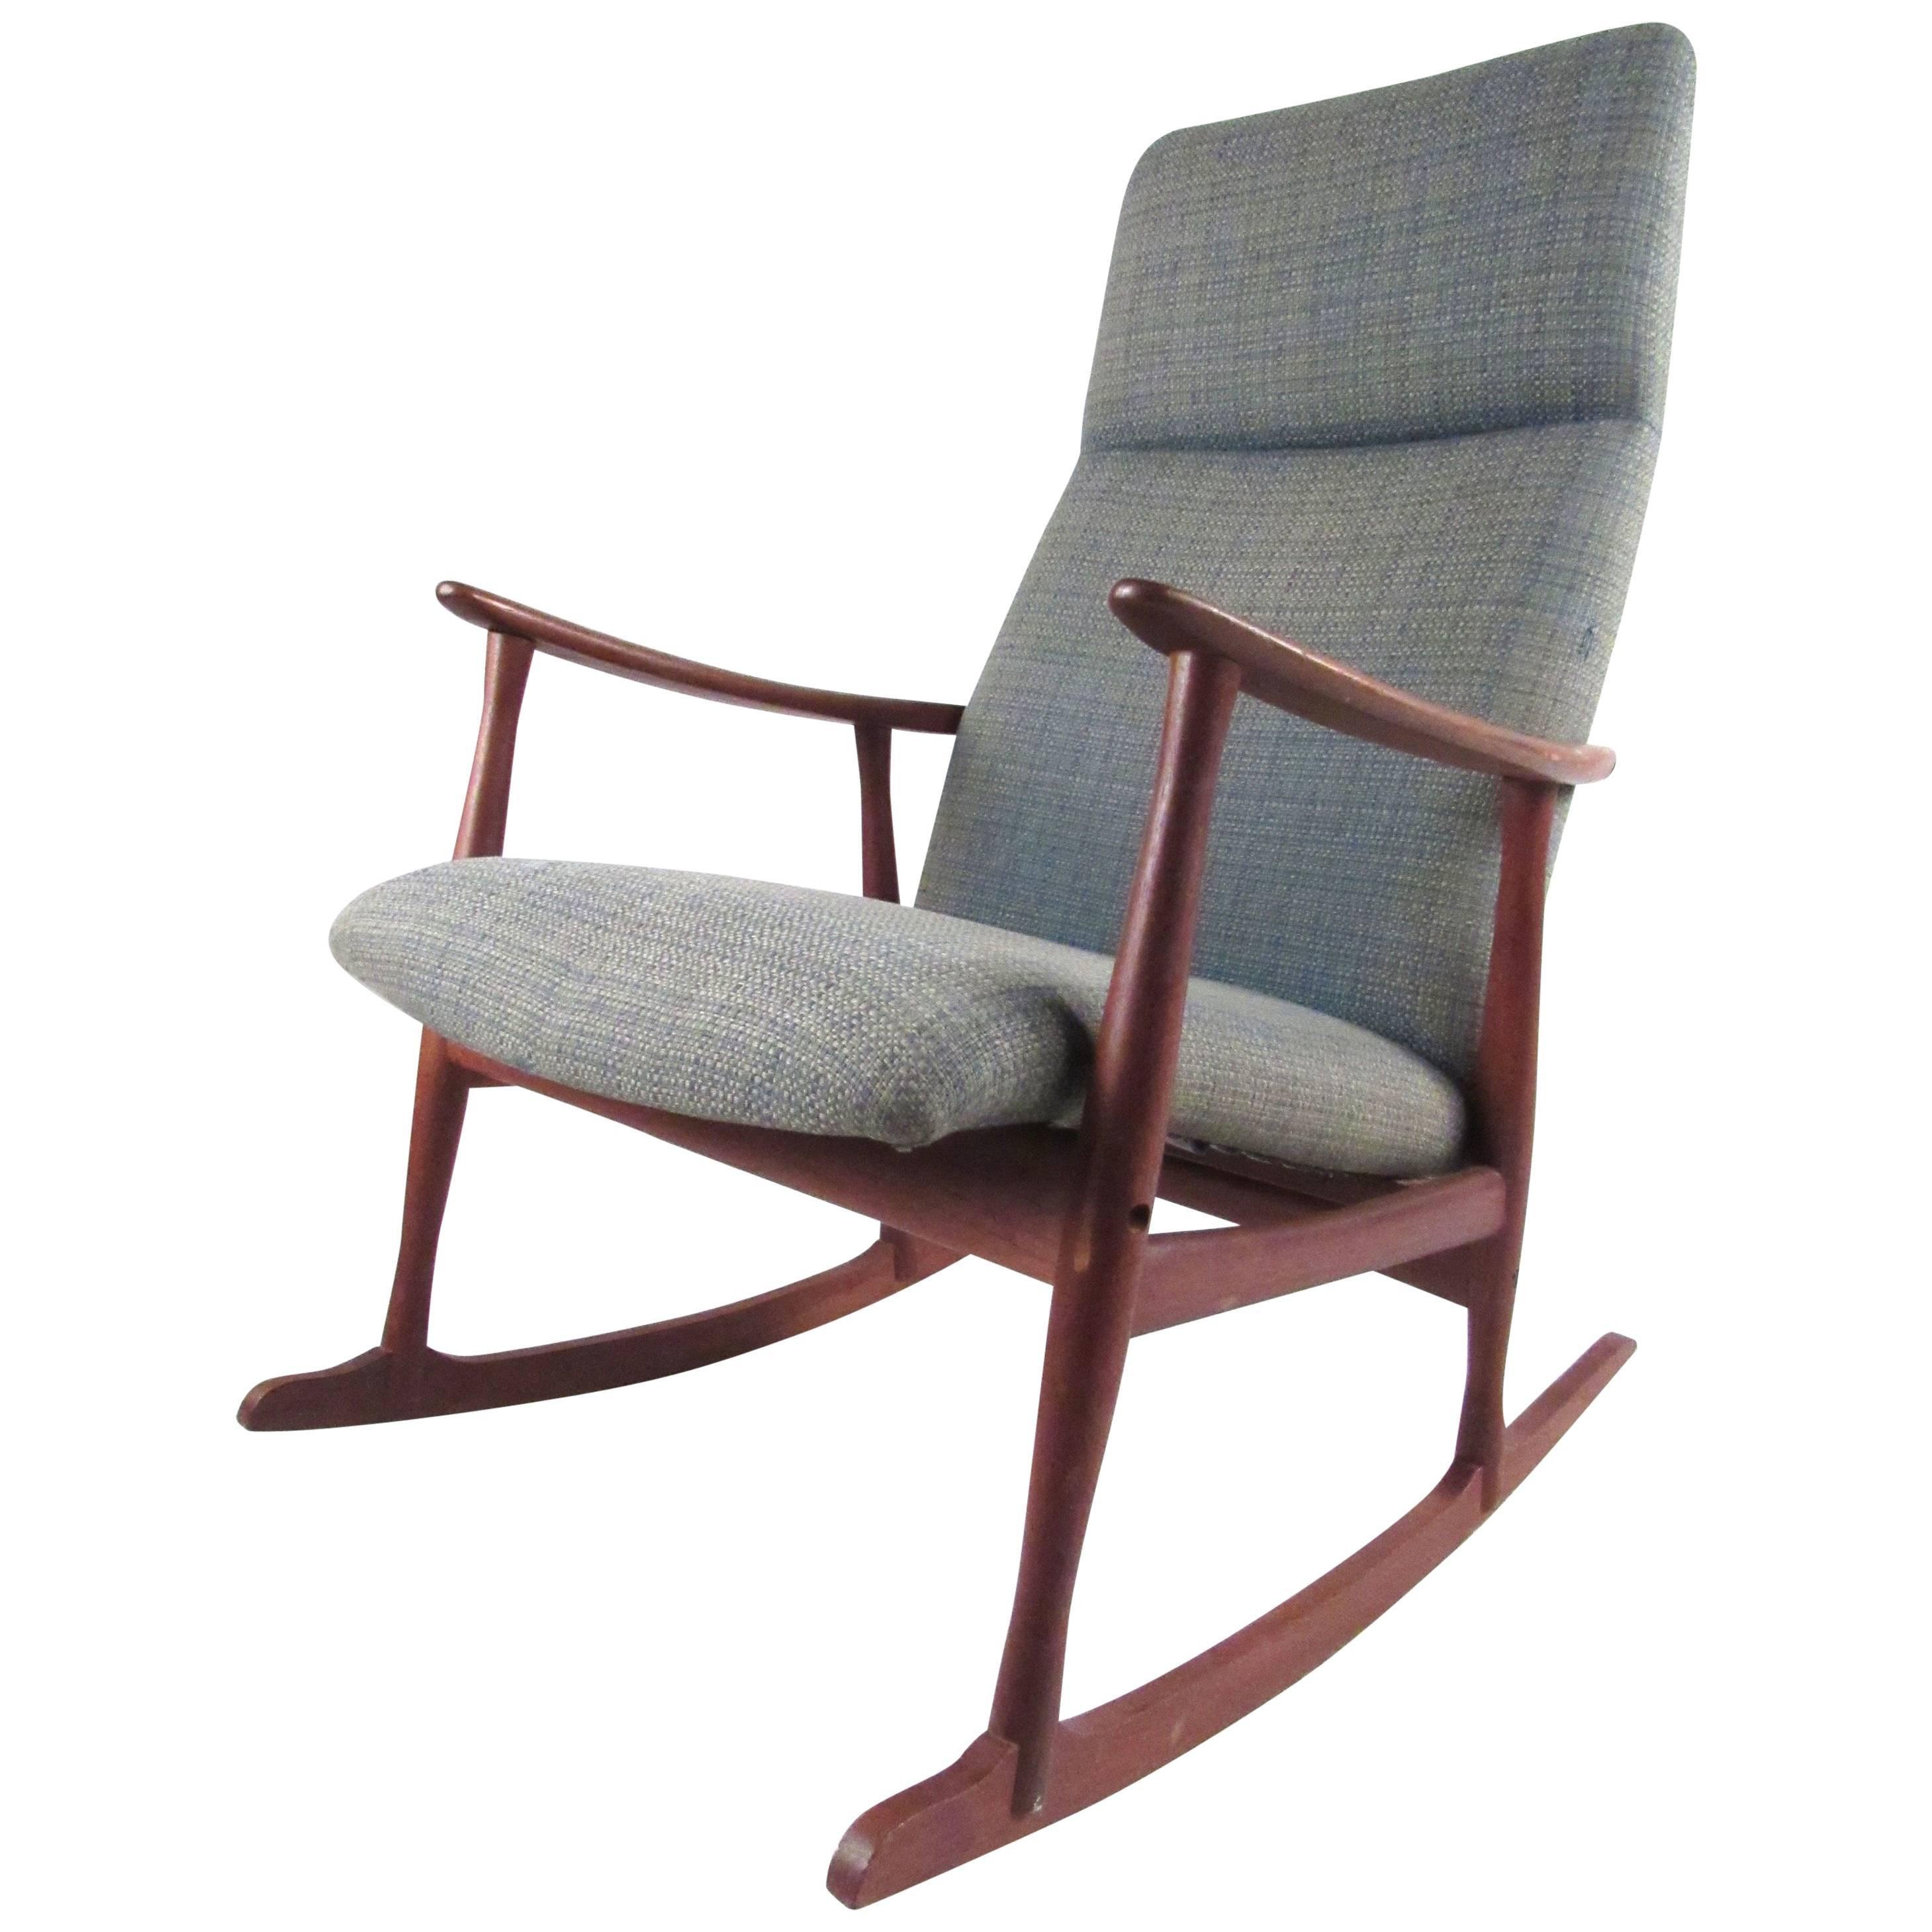 Classic Mid-Century Danish Teak Rocking Chair